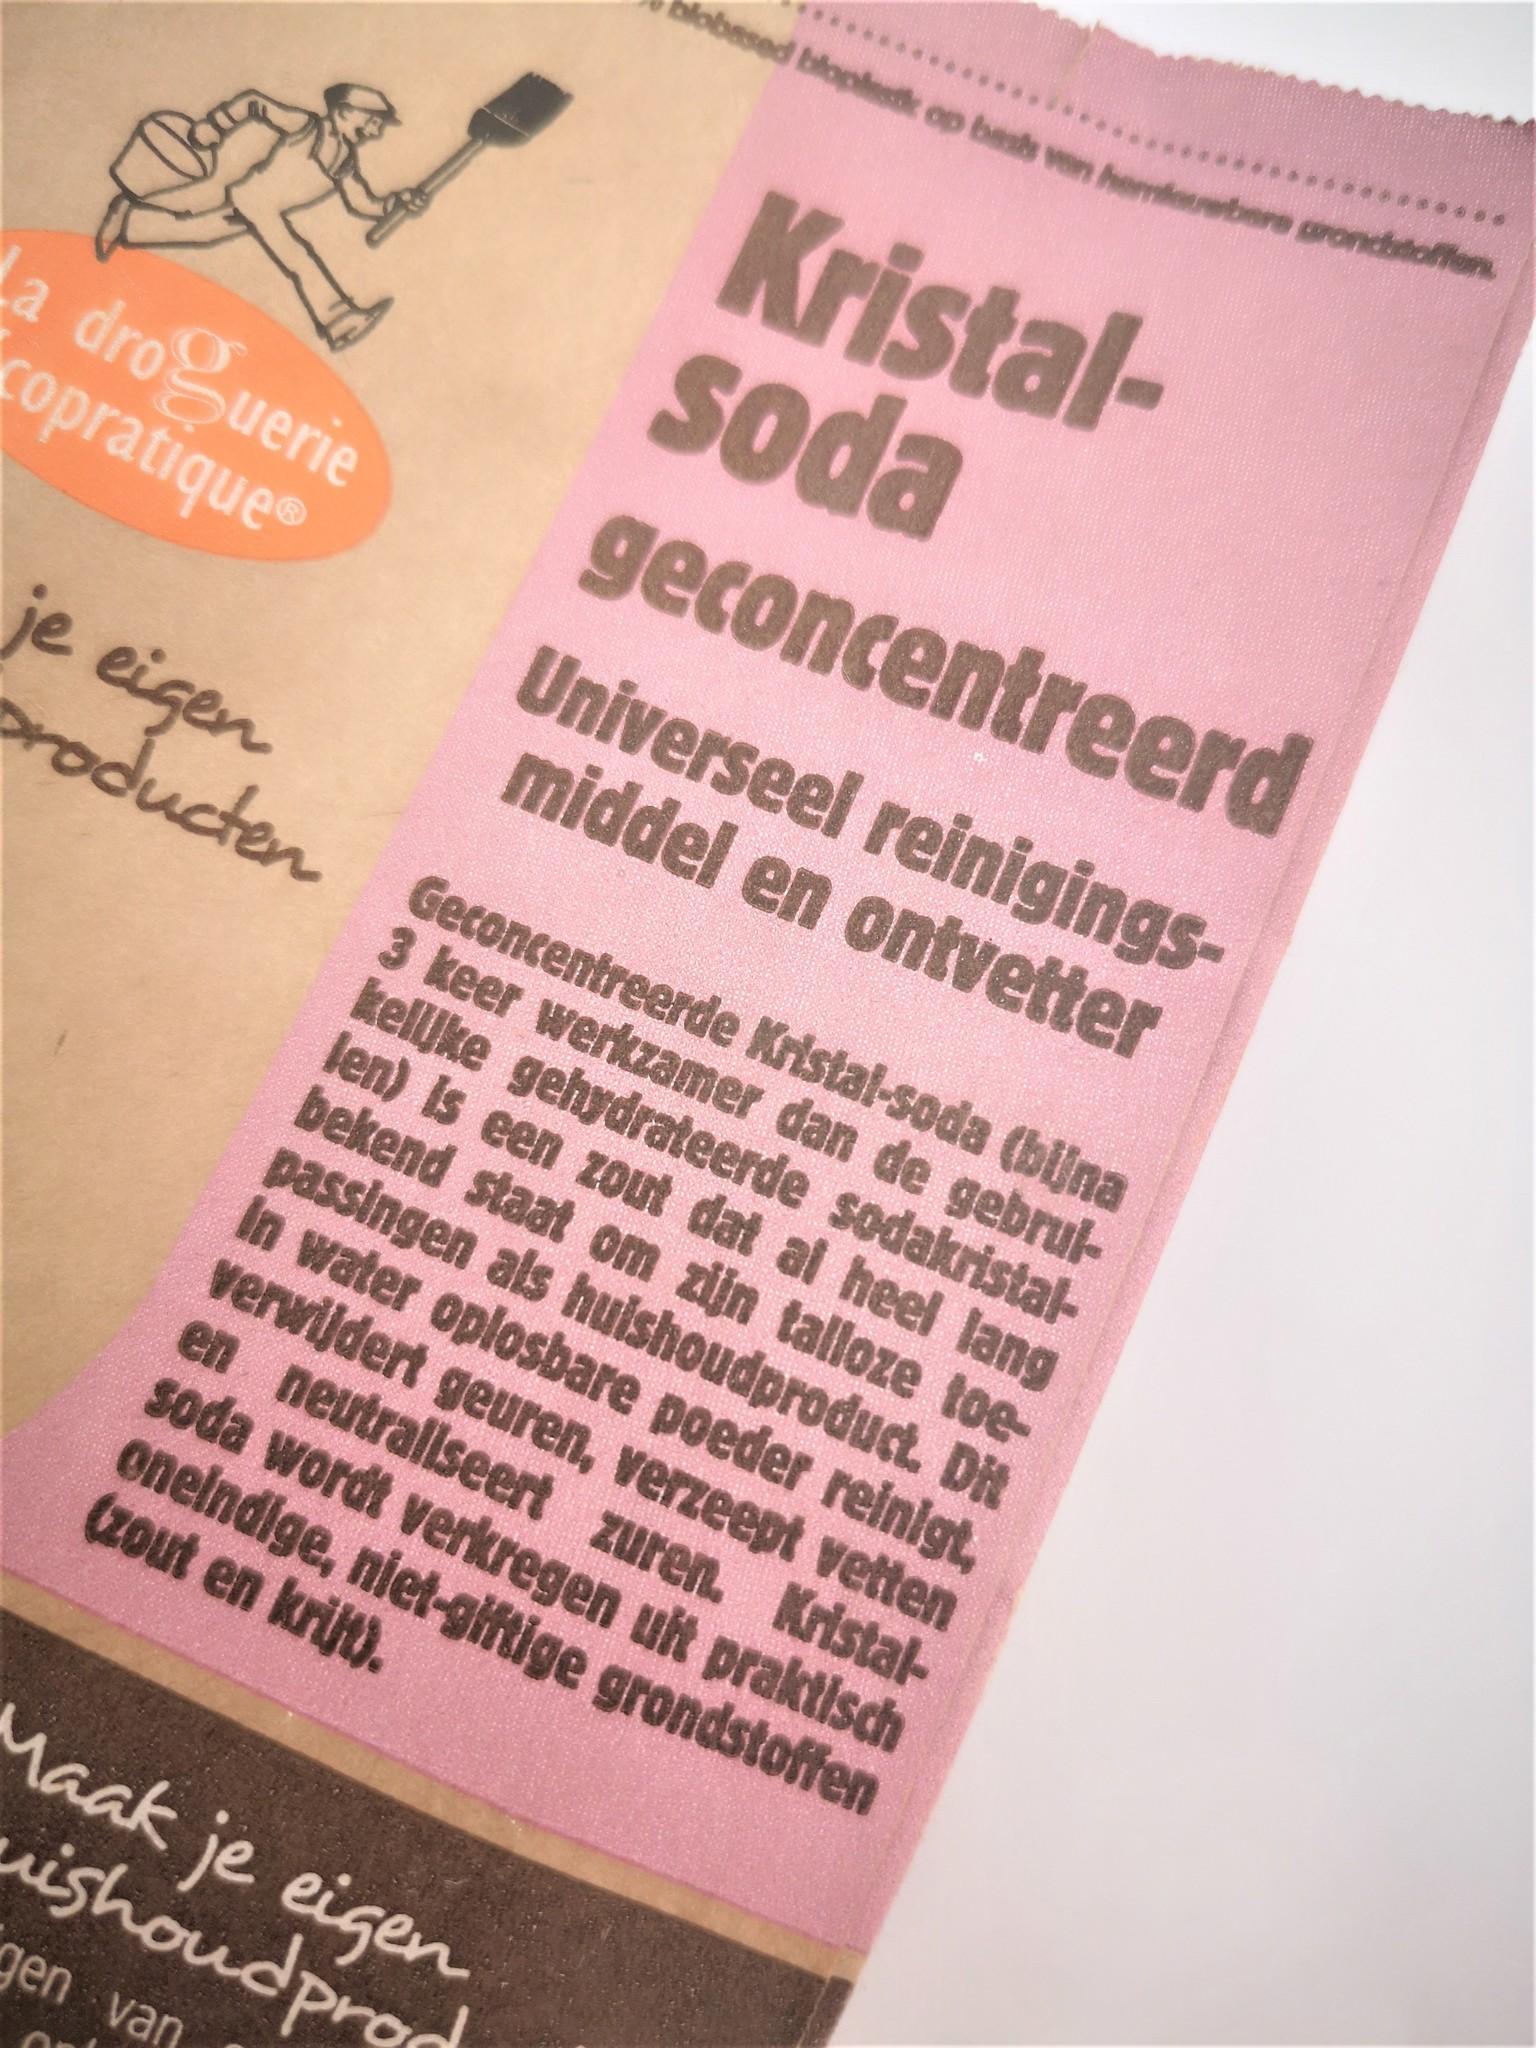 Kristal-soda 500g-1